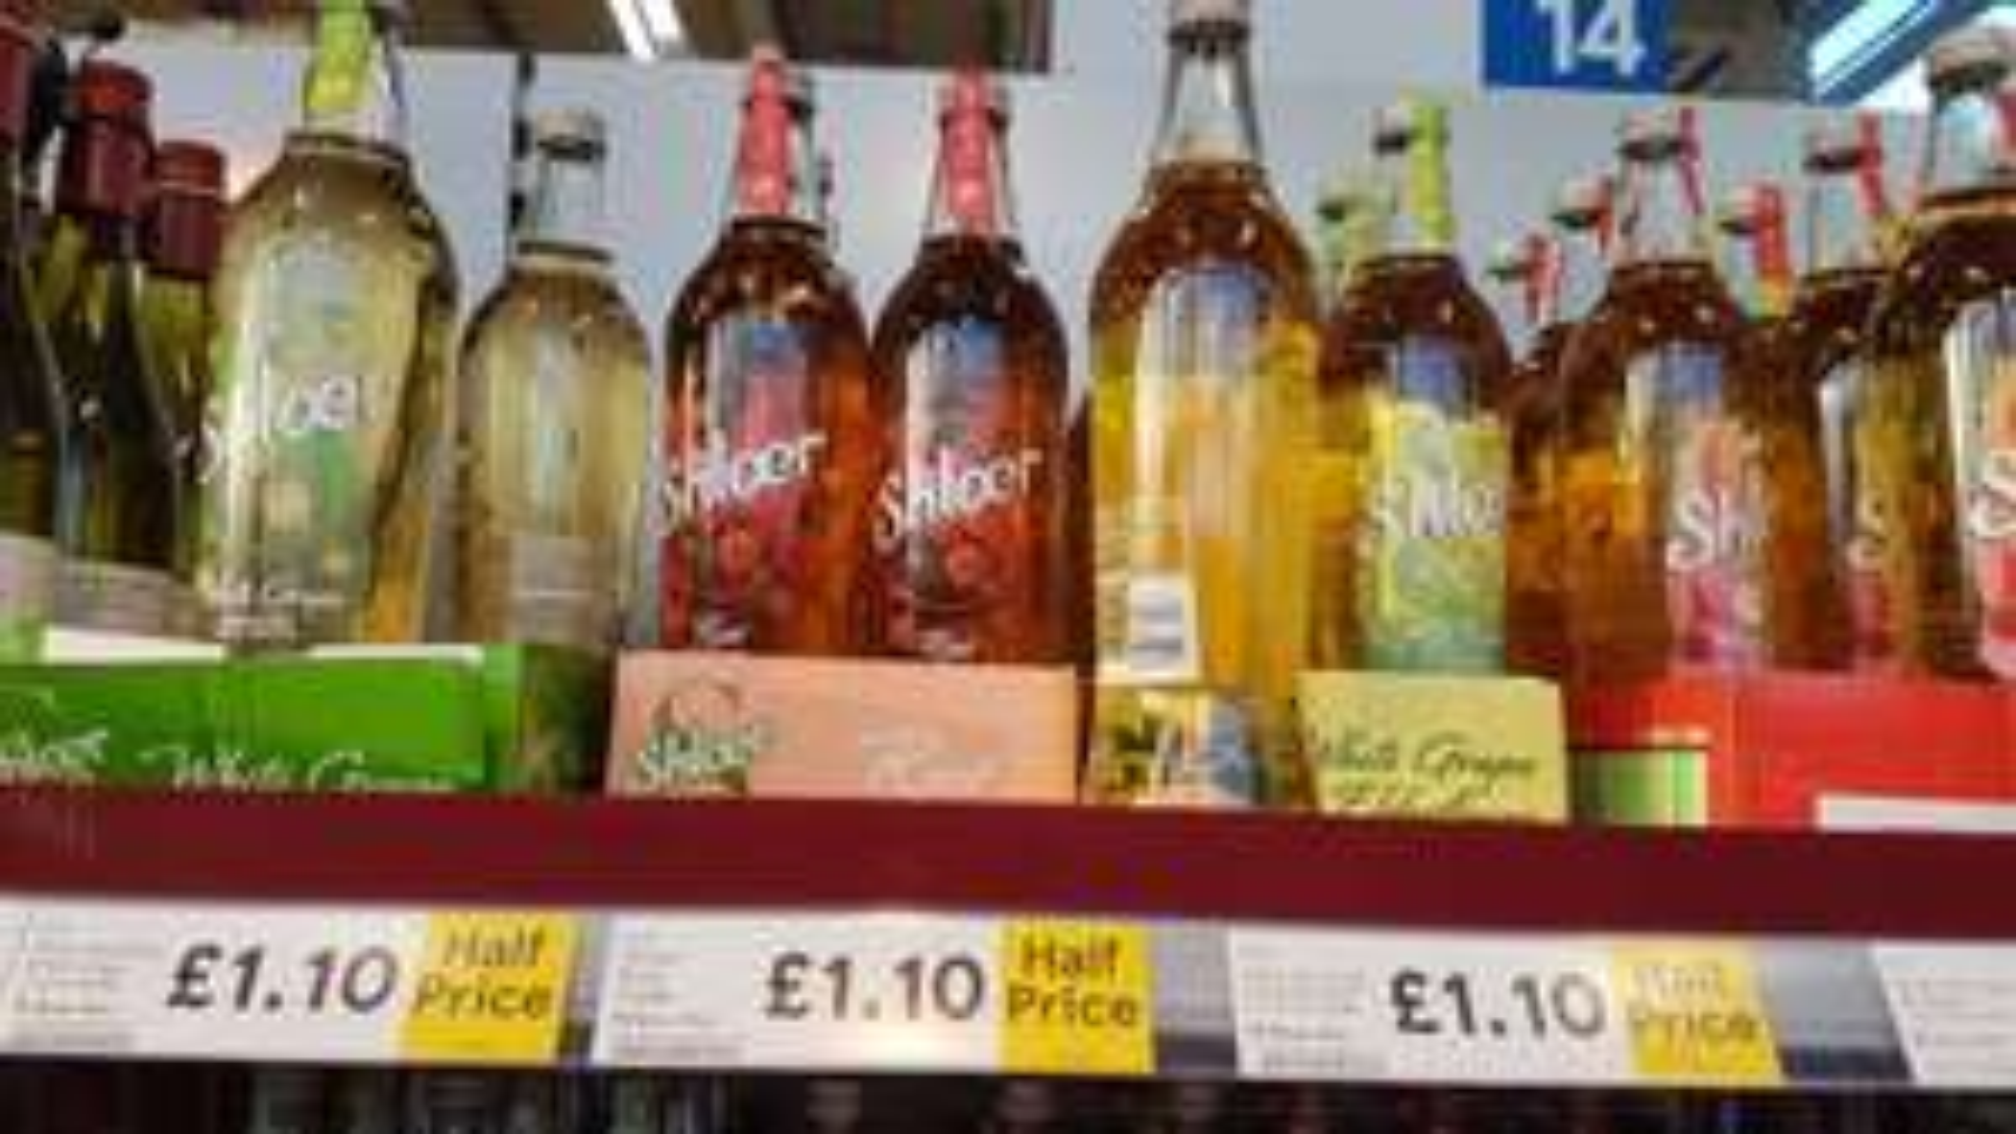 Shloer all flavours 750ml £1.10 @ Tesco